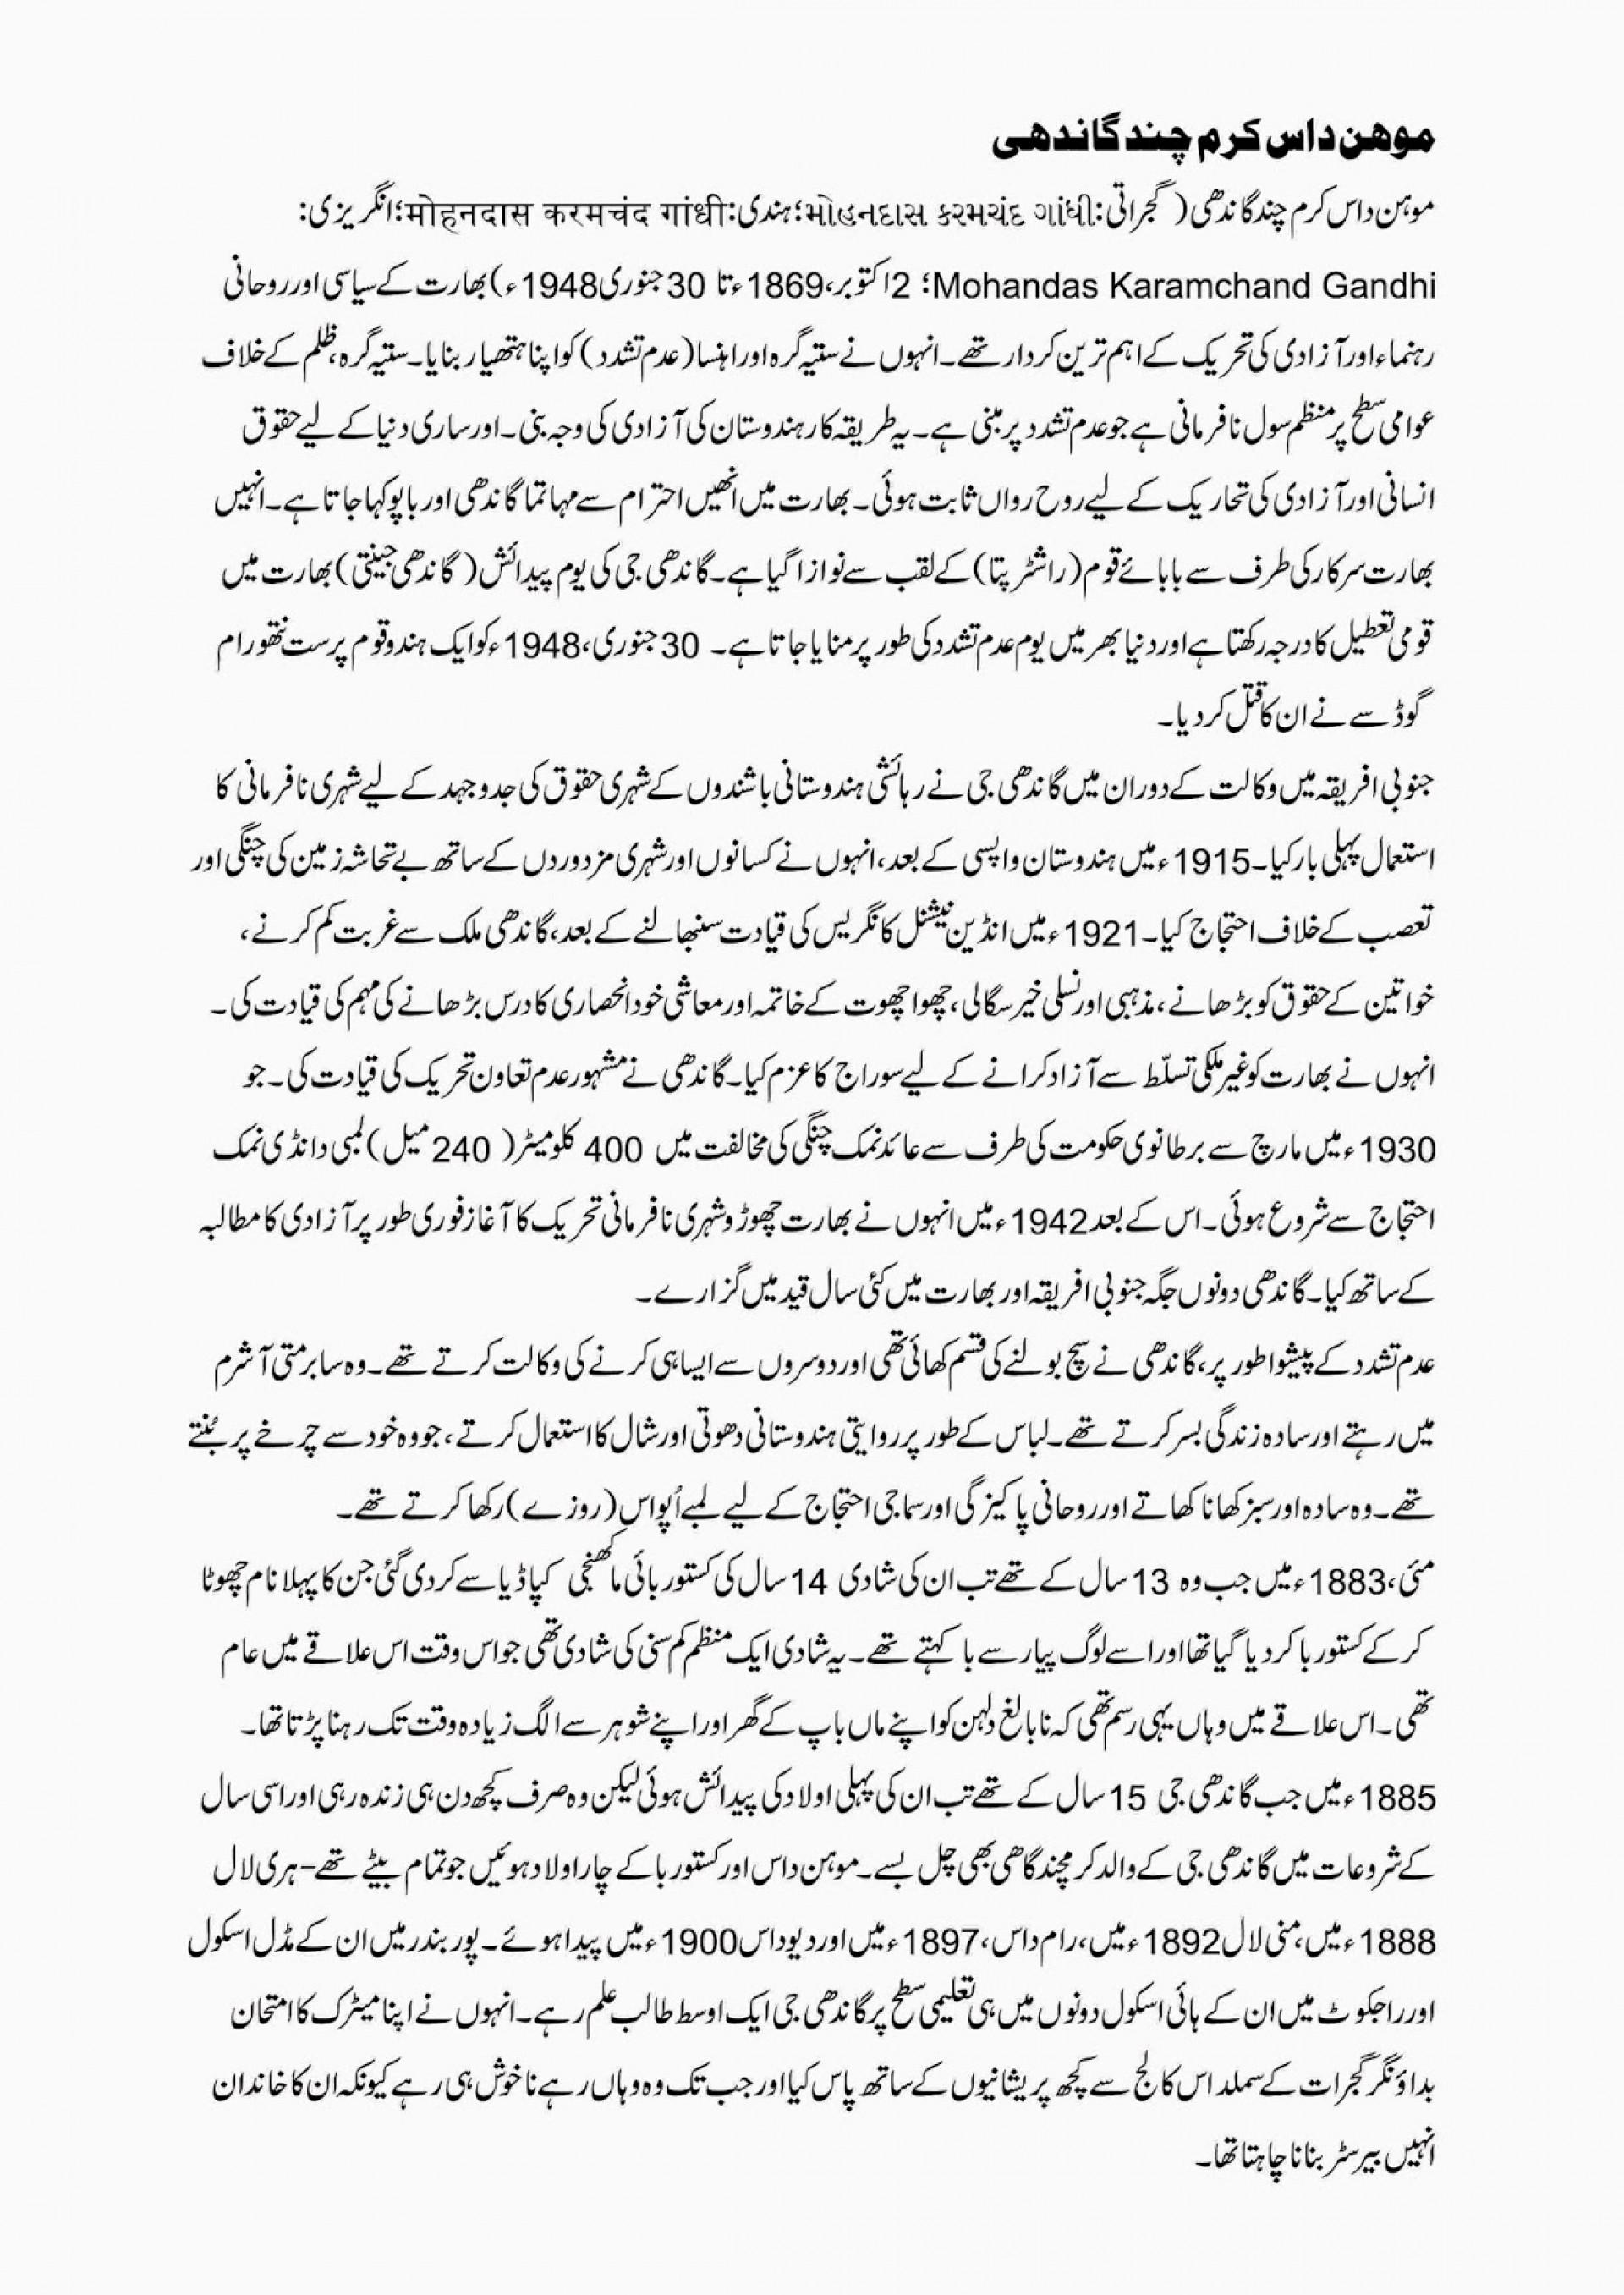 001 Mahatma Gandhi Essay In Urdu Essay2bmahatma2bgandhi2burdu2b1 Imposing Language Jayanti Speech 1920